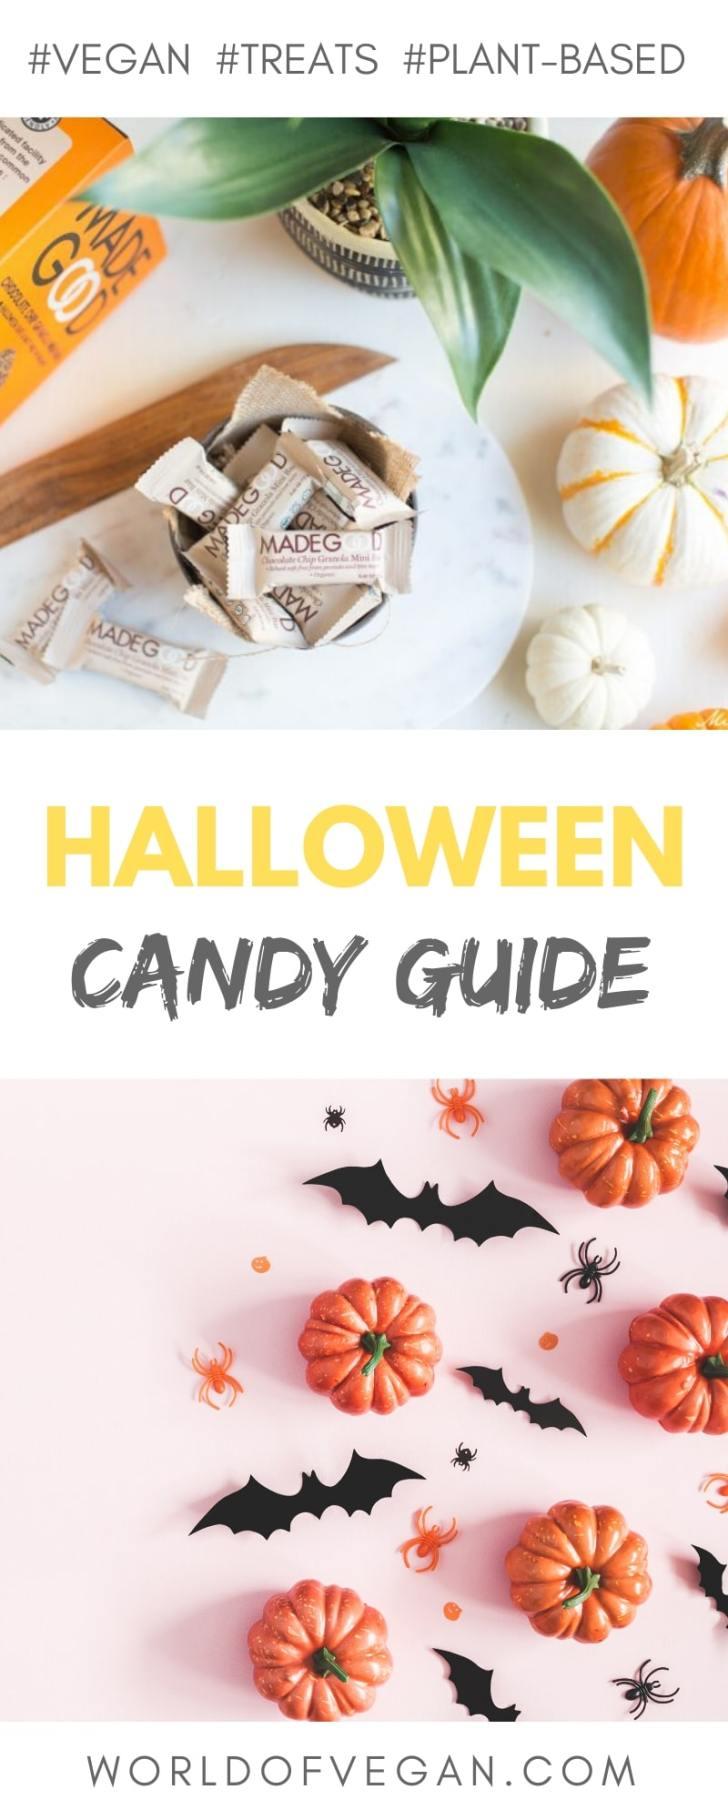 Vegan Halloween Candy Guide | World of Vegan | #vegan #candy #halloween #treats #wolrdofvegan